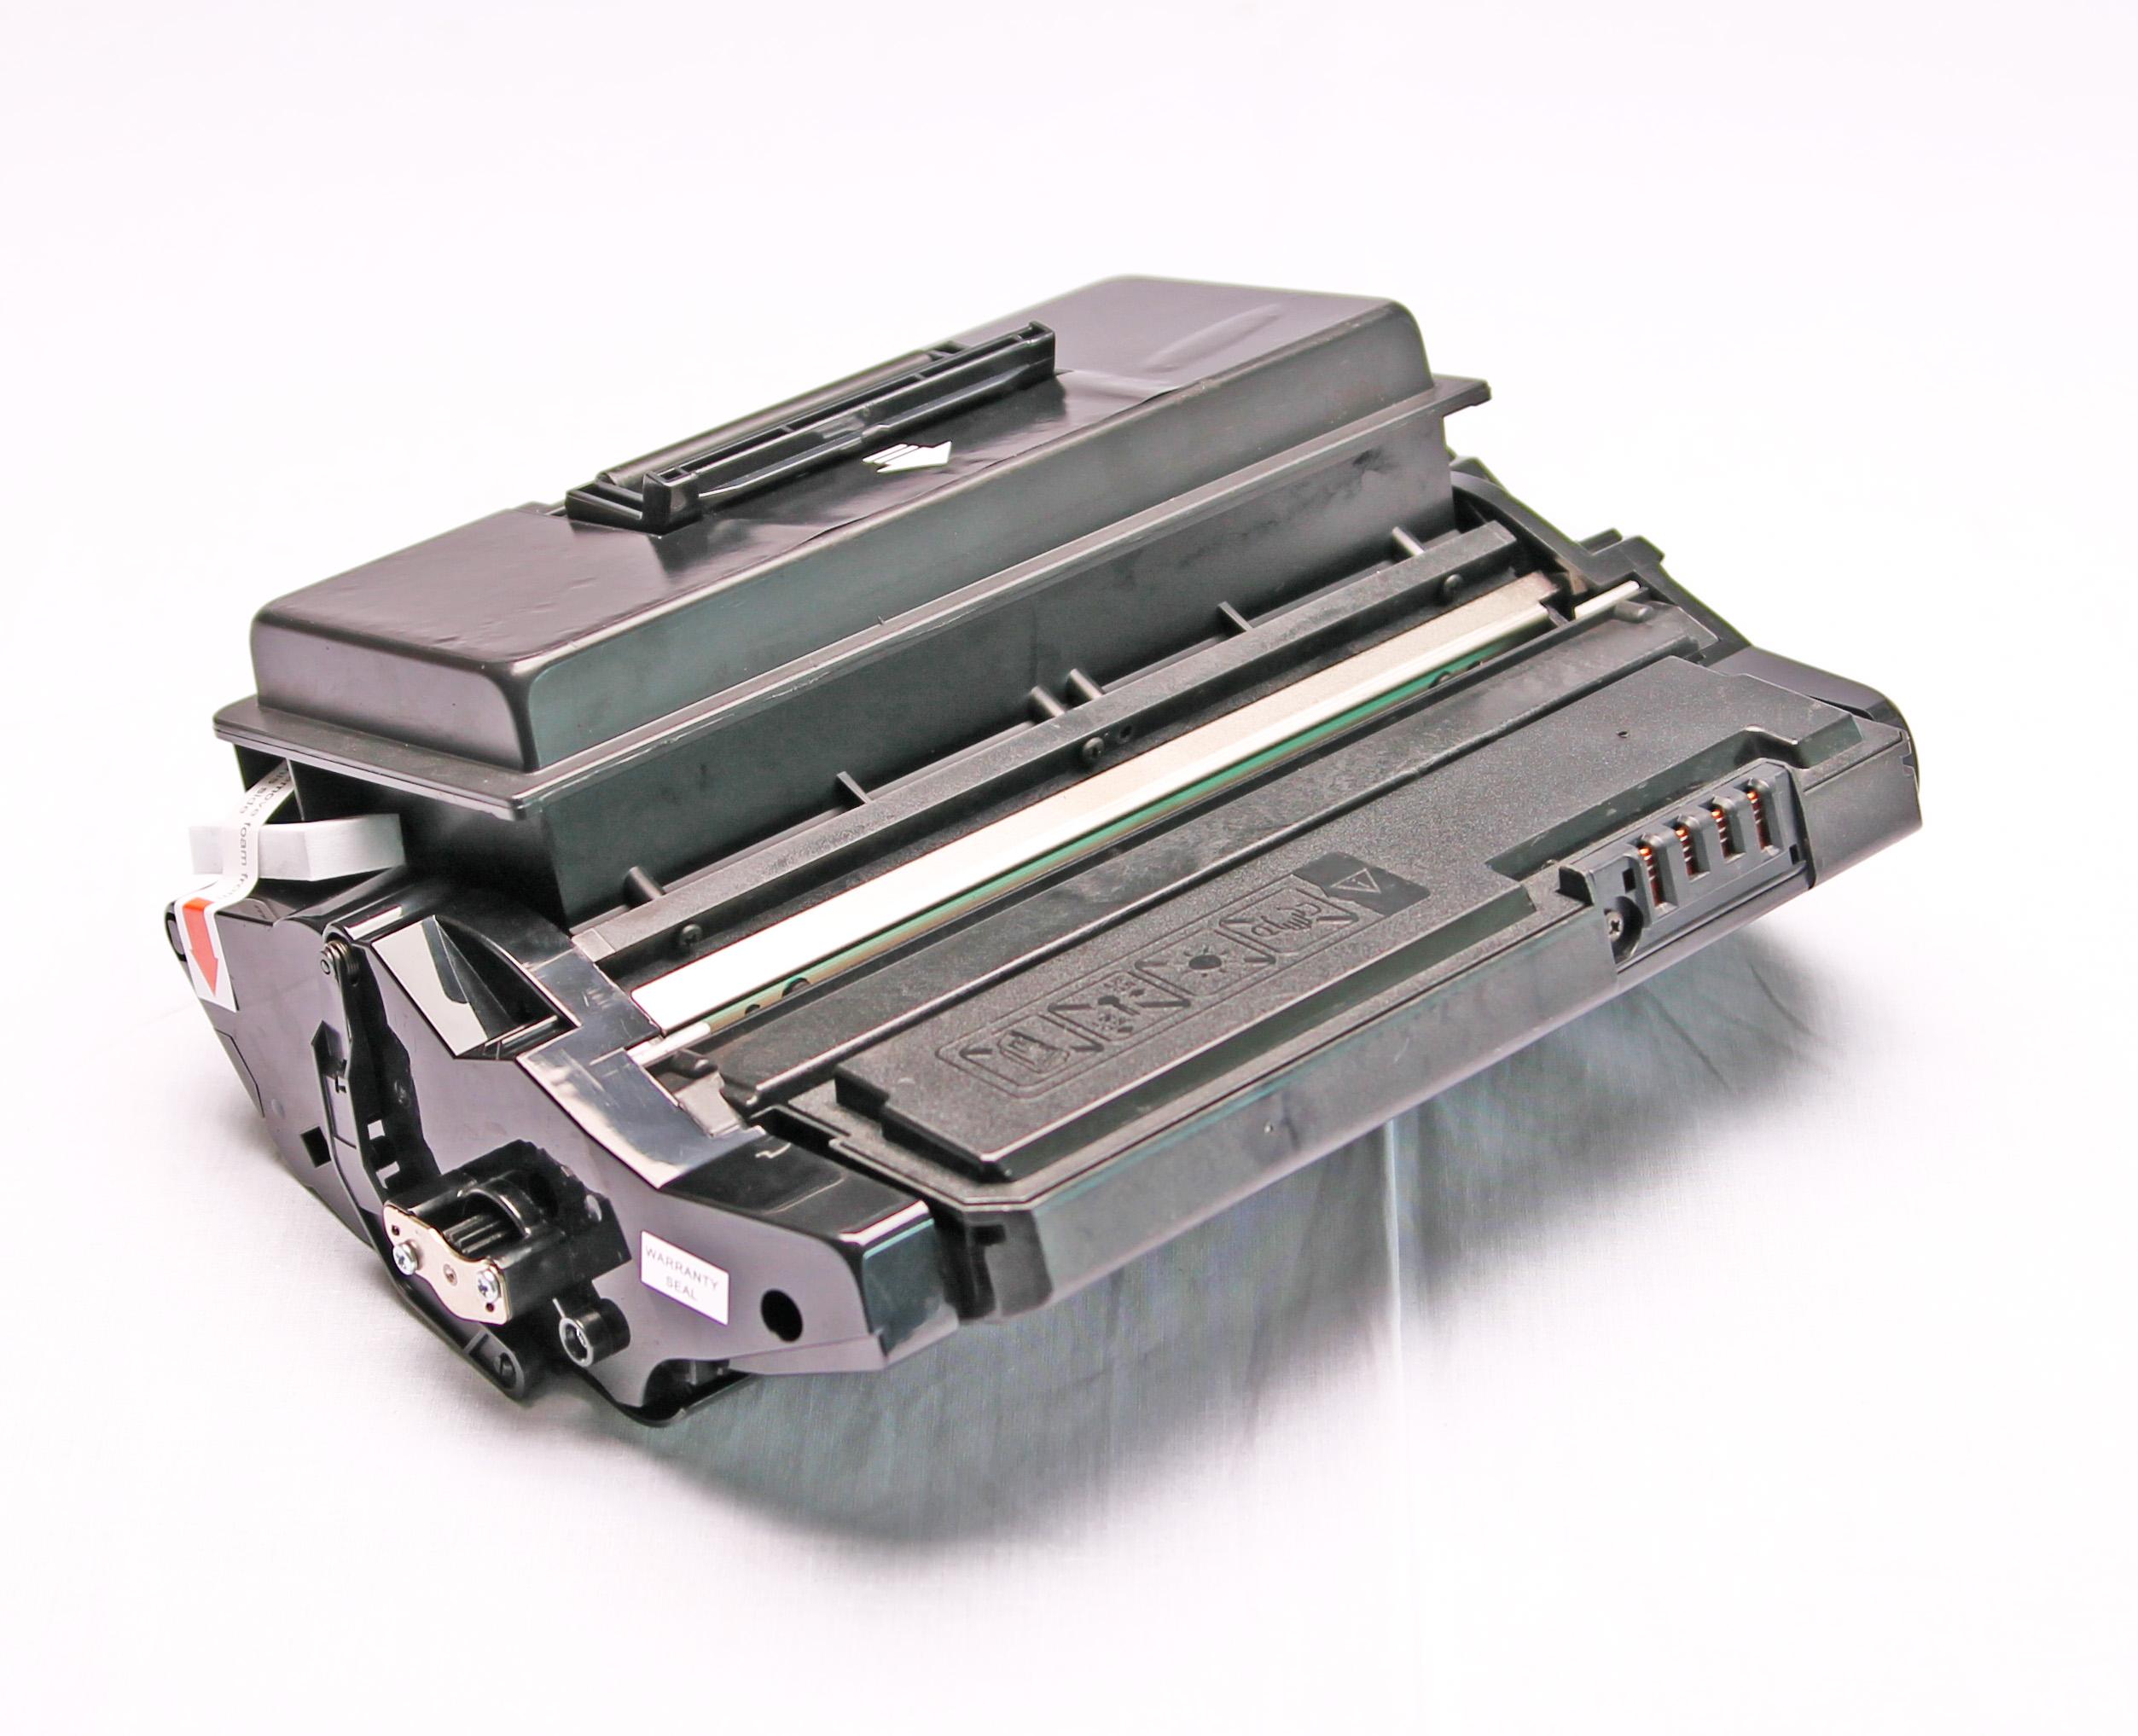 Kompatibel Toner ABC für Samsung Ml4550 Ml4551